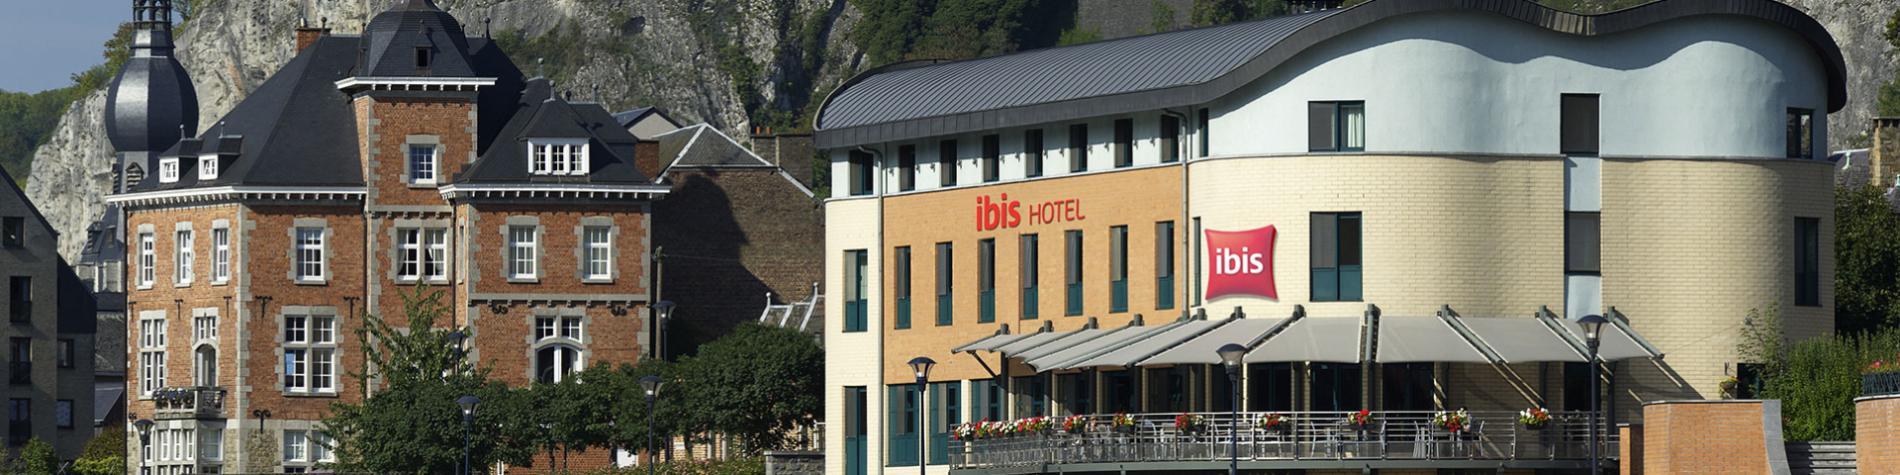 Dinant - Hôtel IBIS